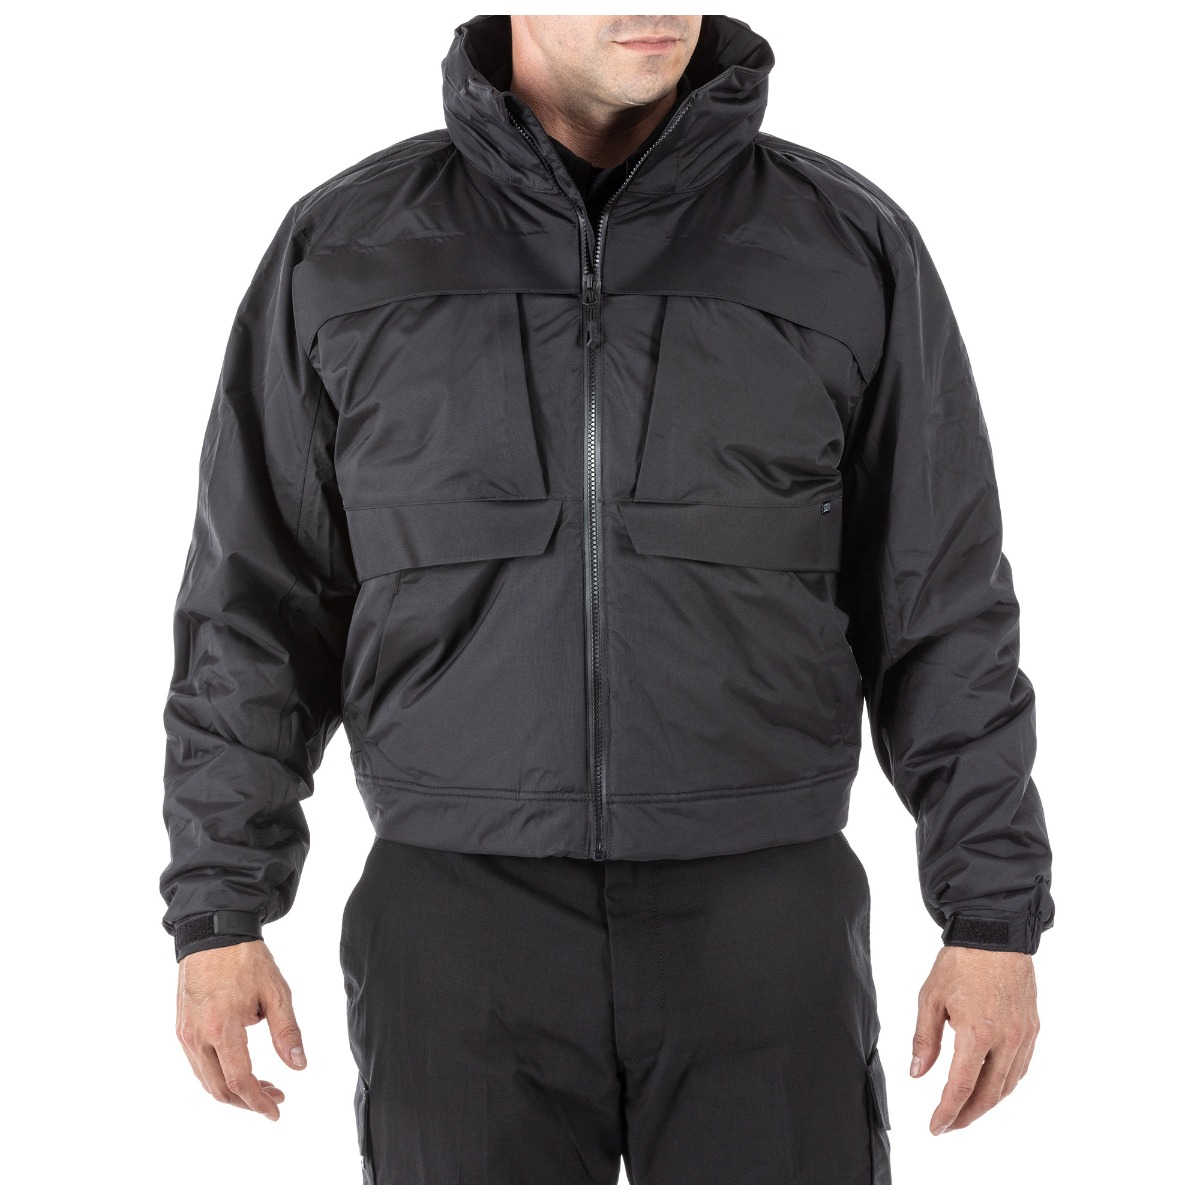 5.11 Tactical Men's Tempest Duty Jacket (Black)